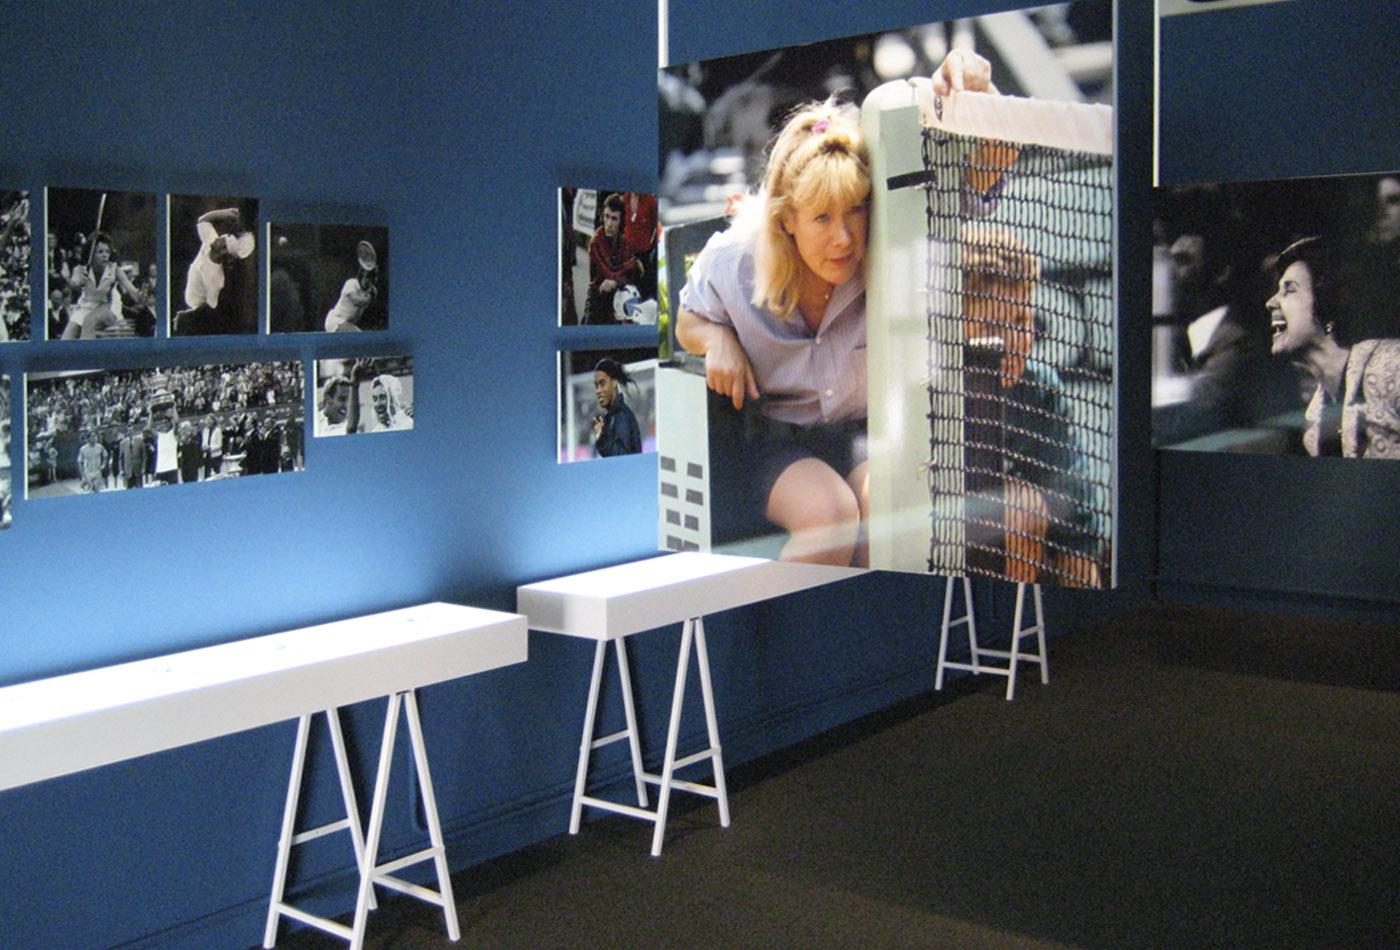 sports-exposicio-deporte-creartiva-disseny-caixaforum-avelino-pi-